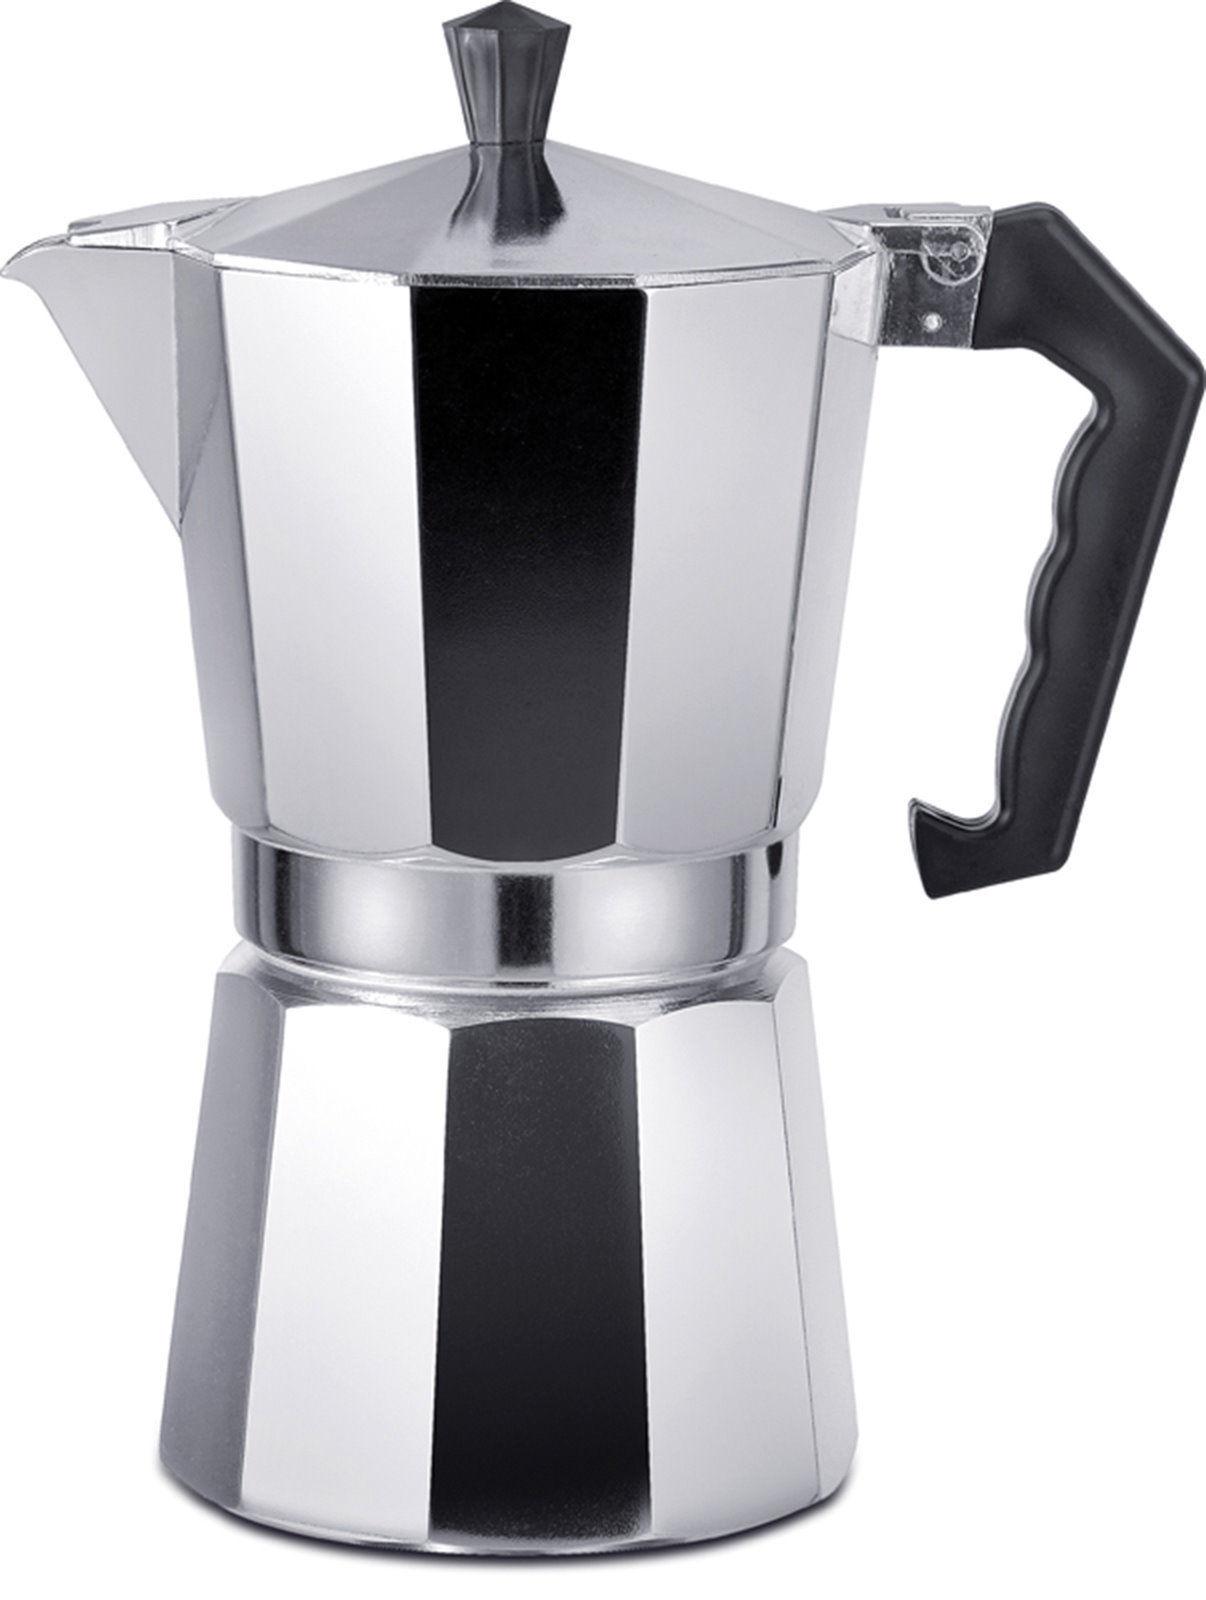 Tassen Maker Amsterdam : Alu espressokocher espresso moka express maker tassen